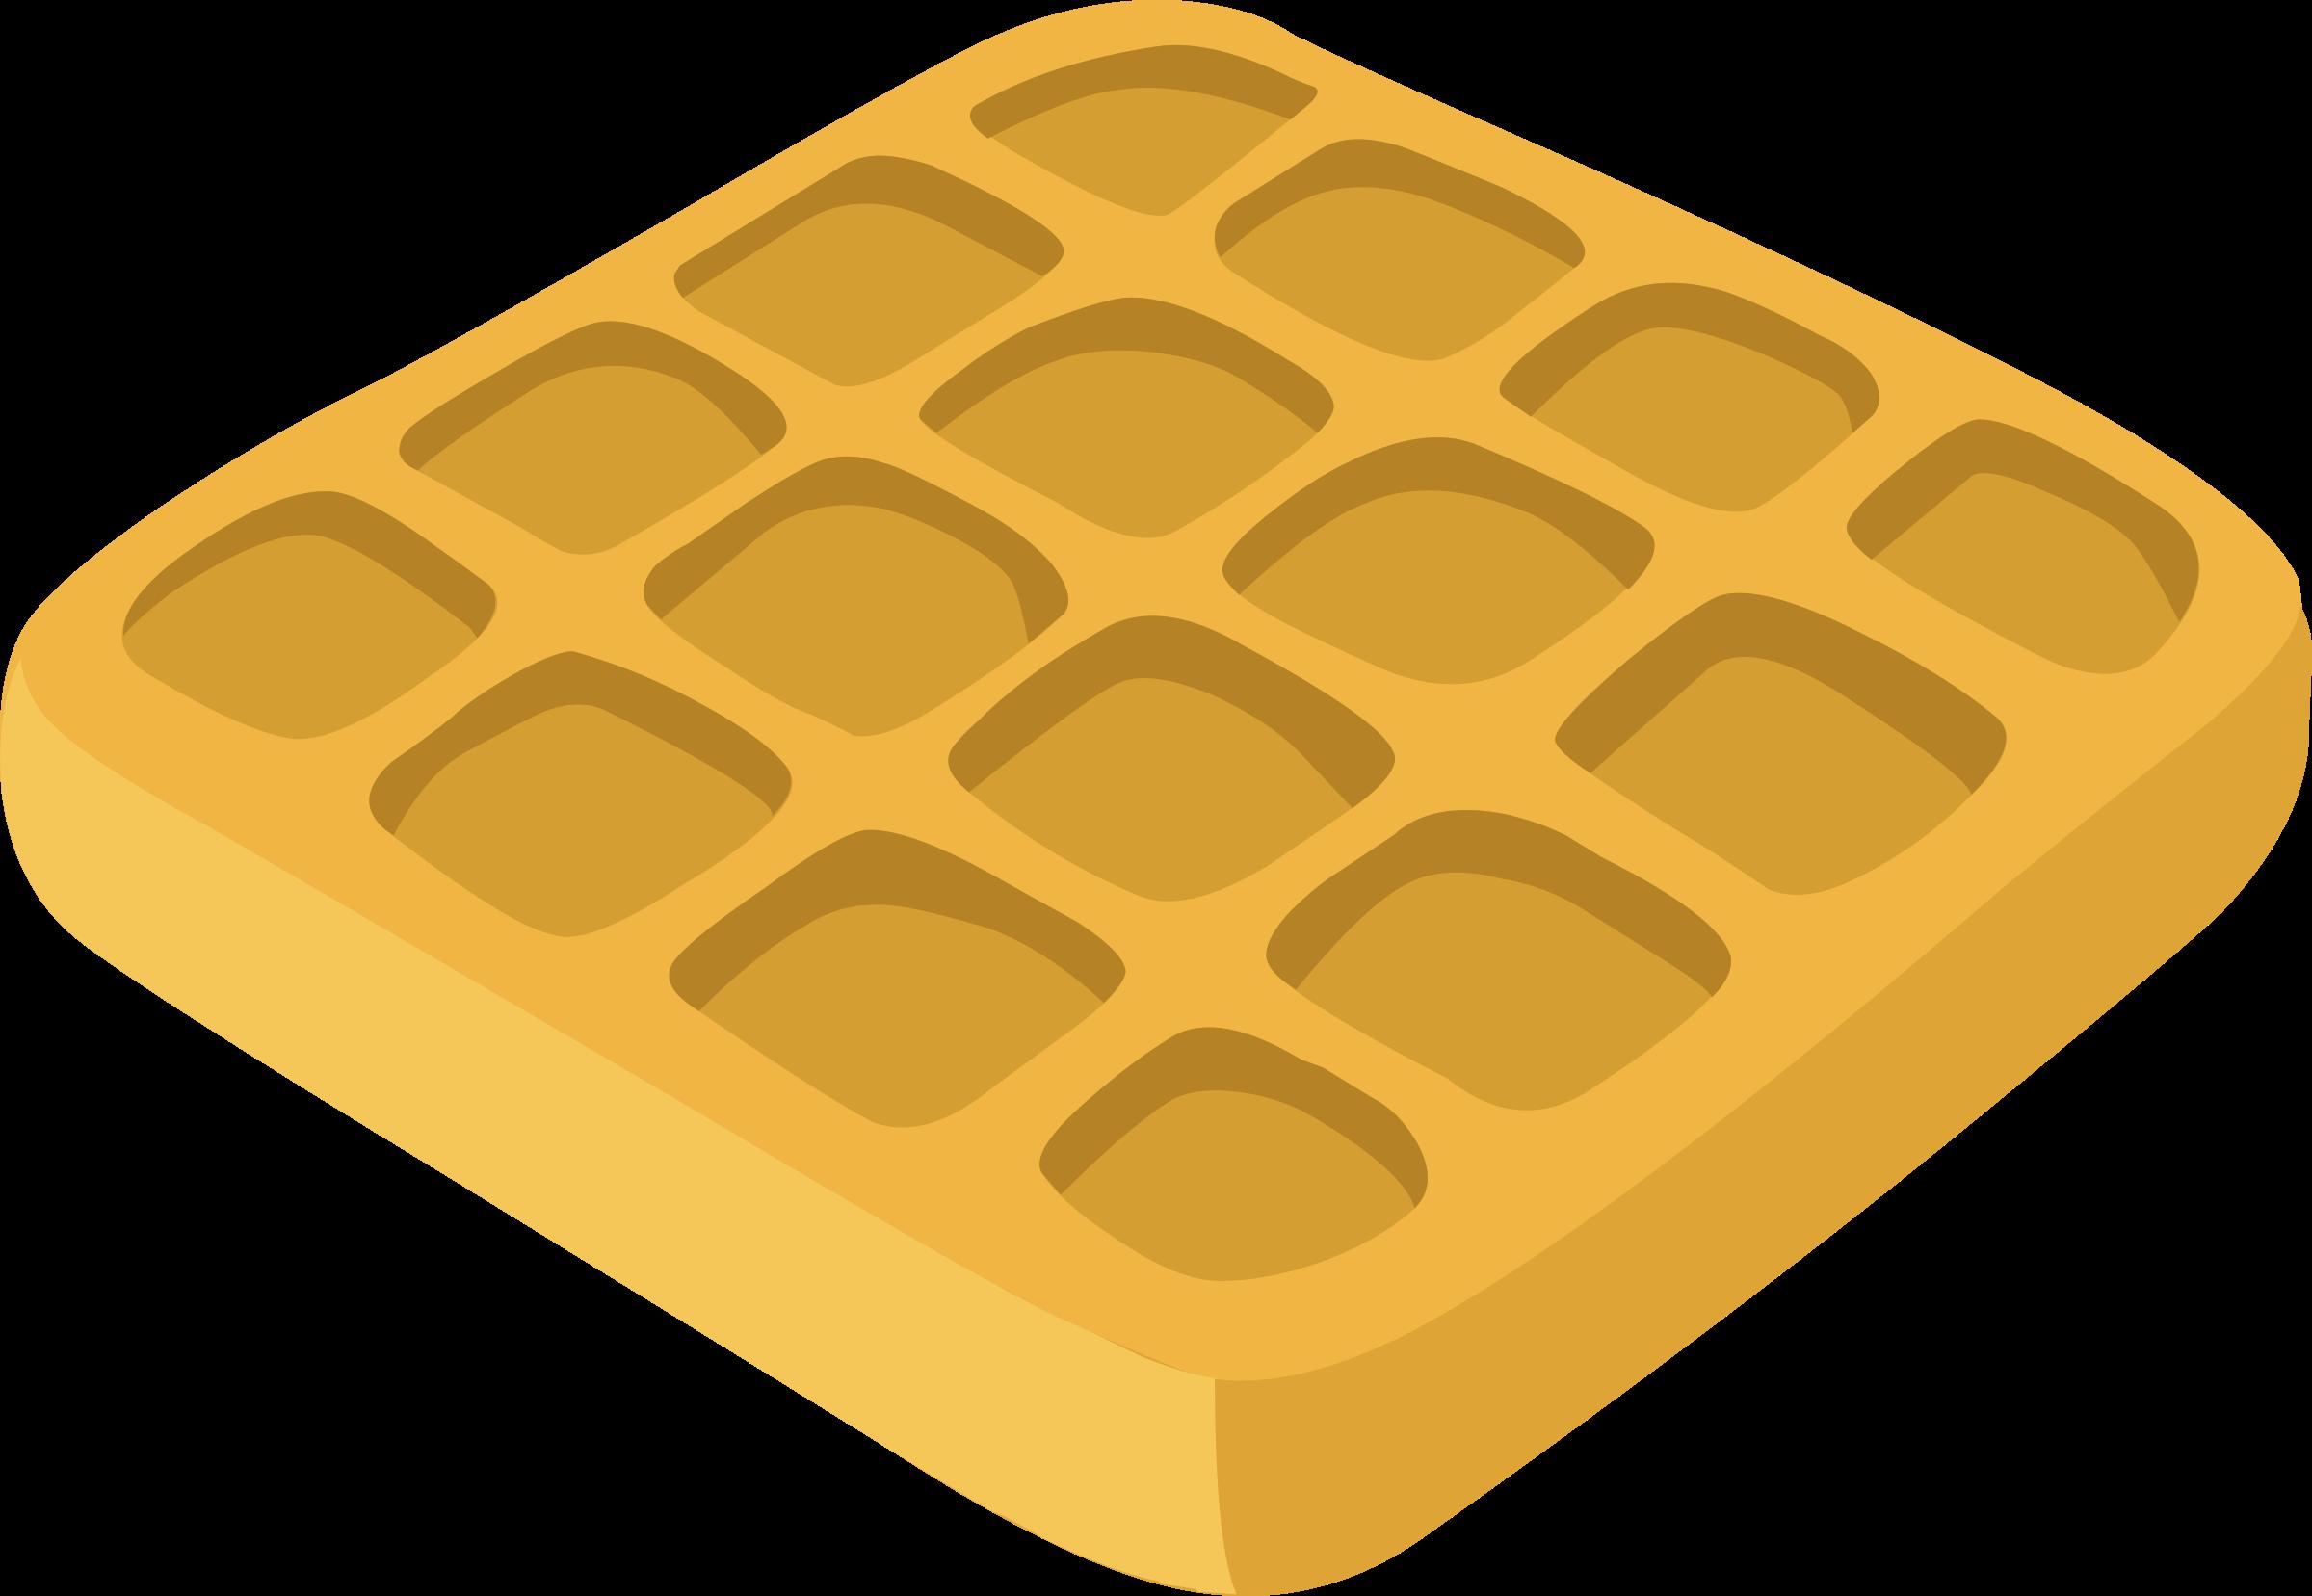 Food waffles big image. Waffle clipart small